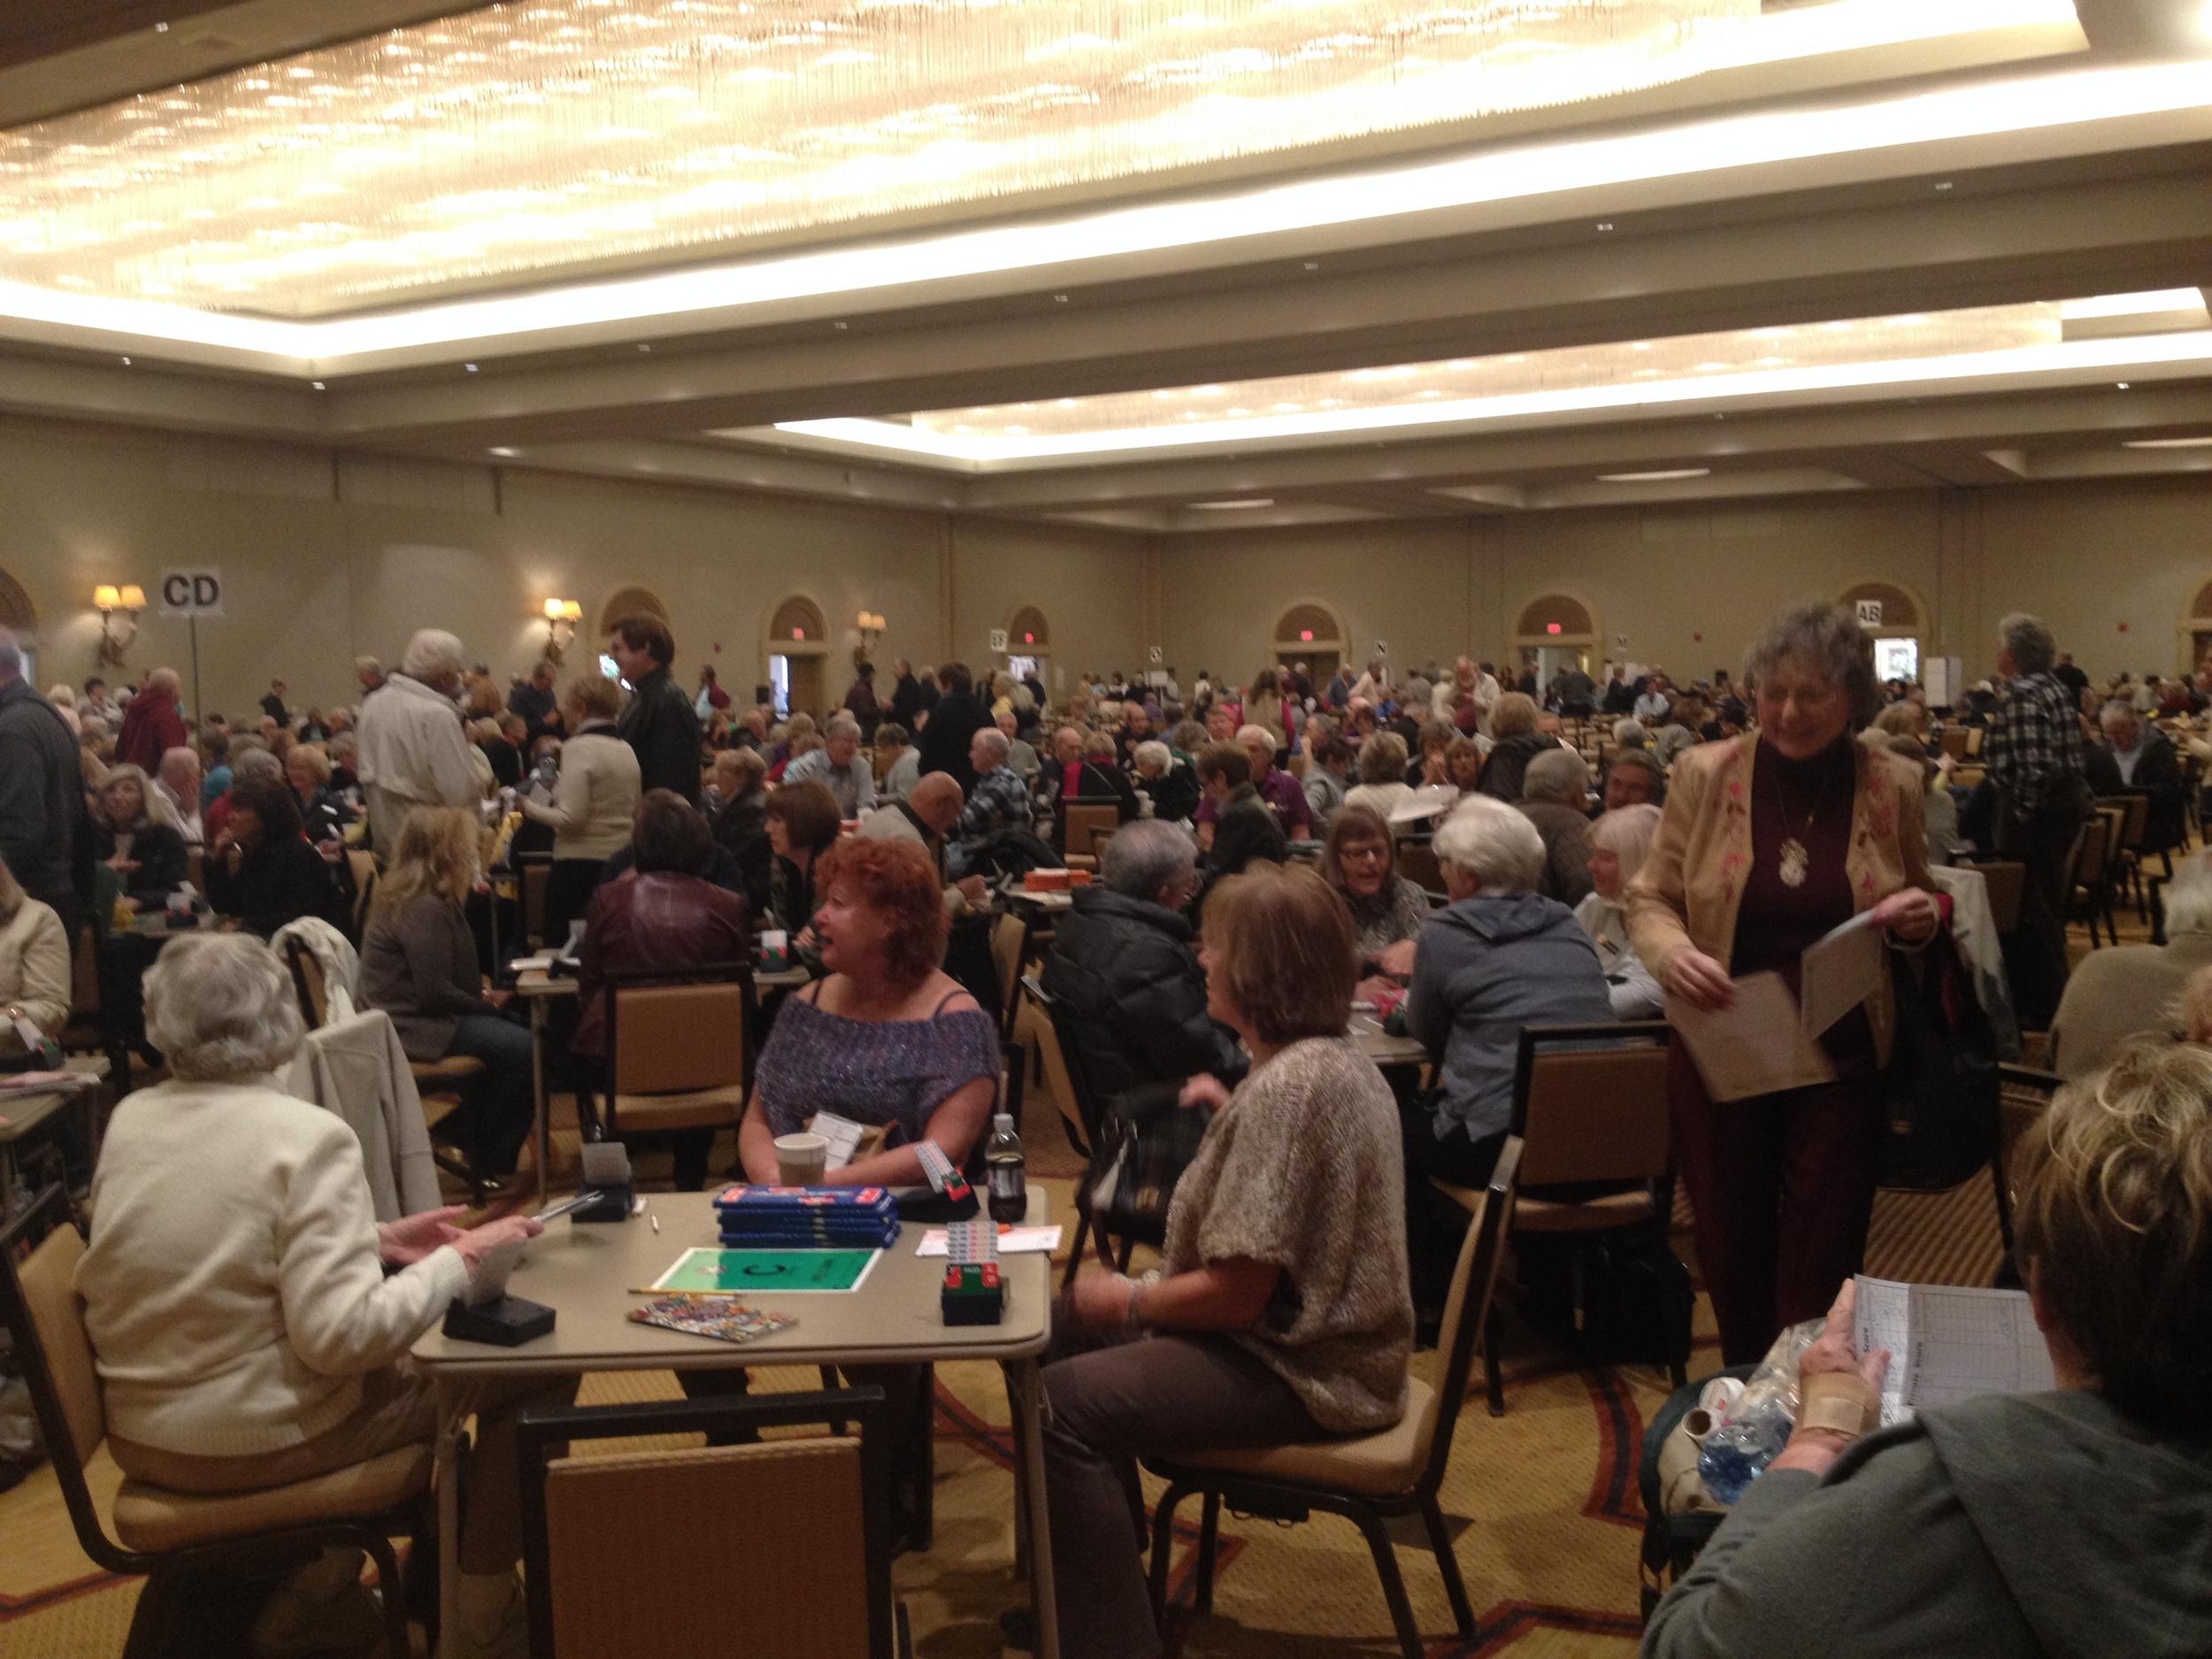 Playing Room, Rancho Mirage